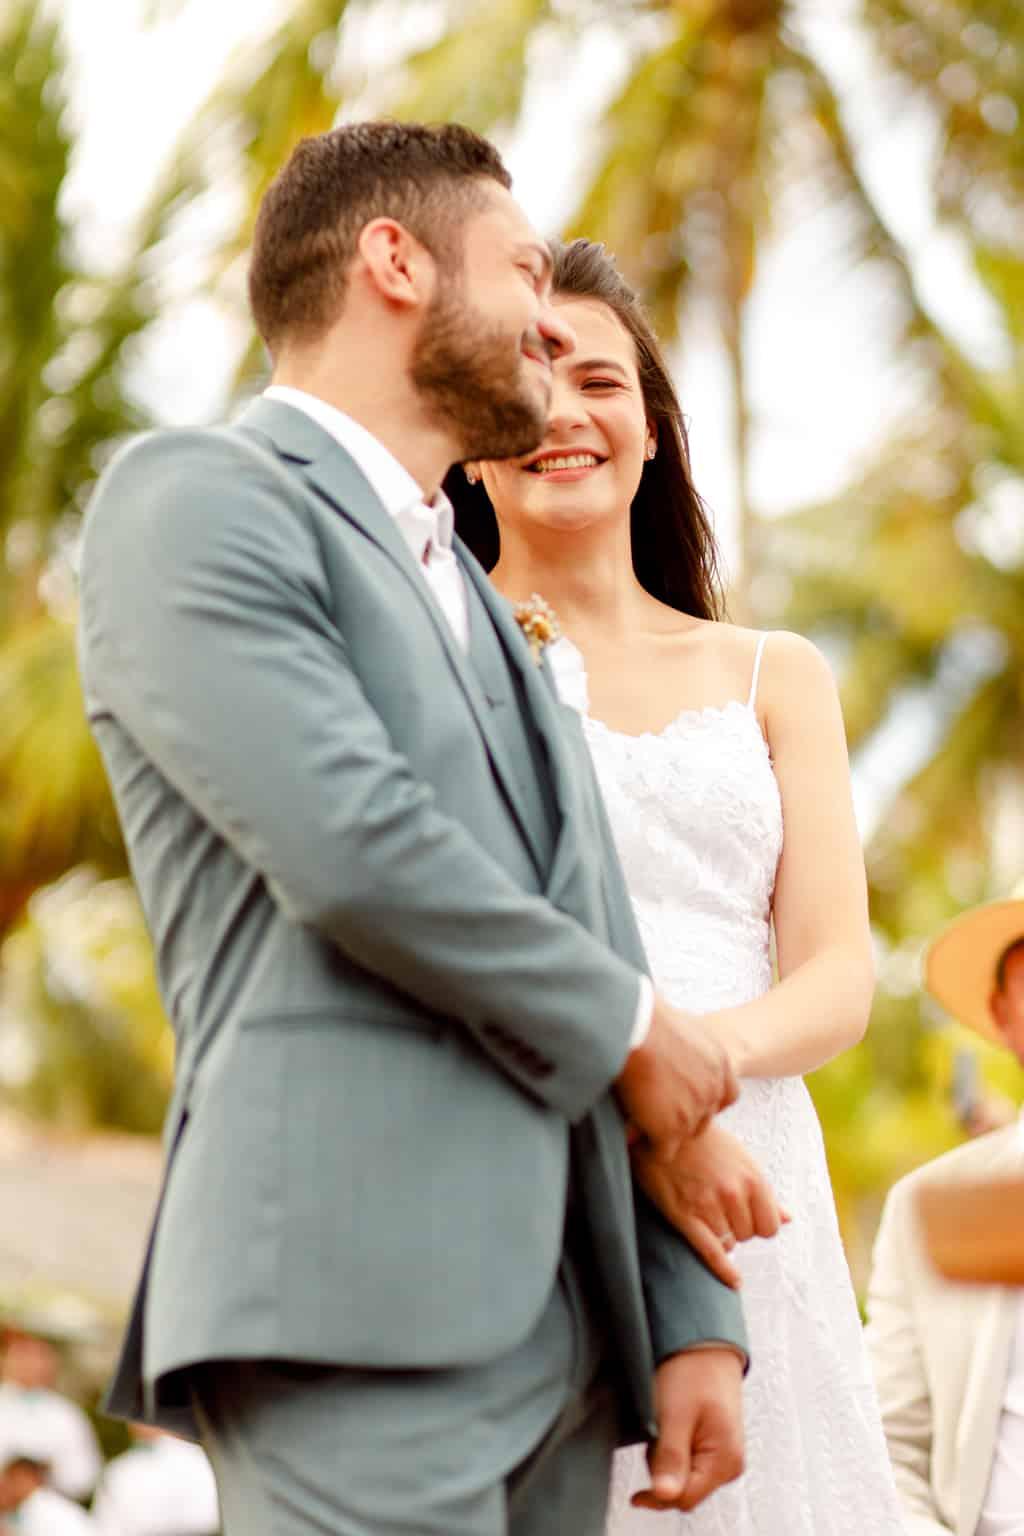 Casamento-Emanuelle-e-Alysson-Fotografia-Tadeu-Nanó-e-Luca-Antunes98